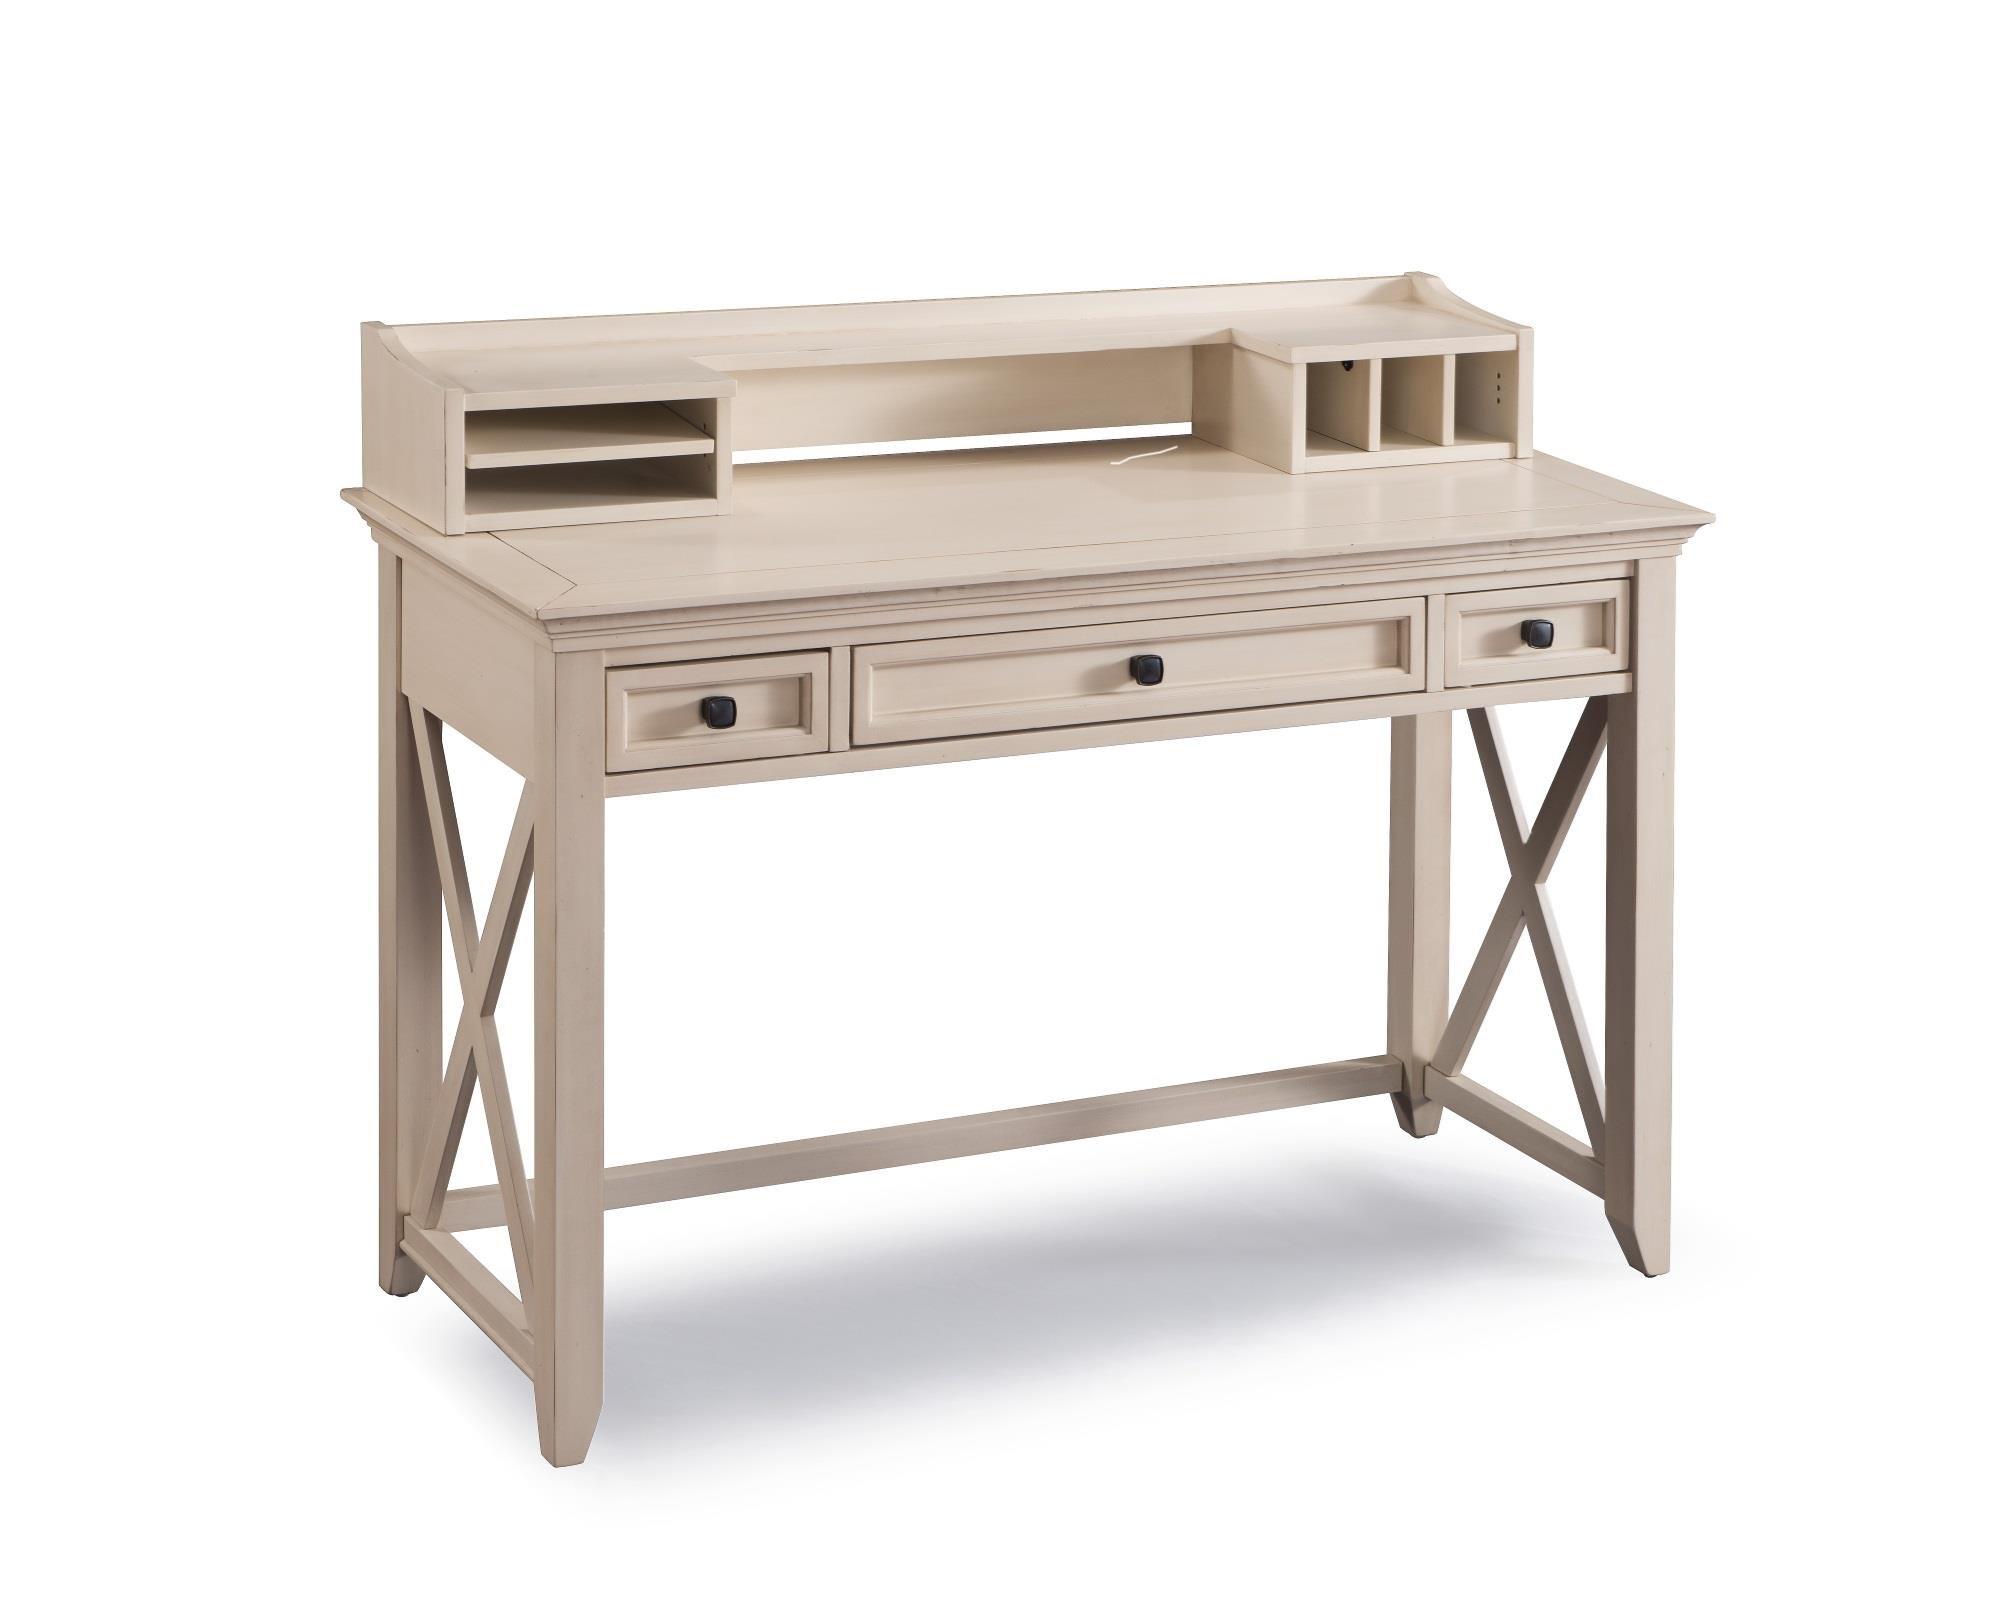 Magnussen Home Kittery Sofa Table - Item Number: T3487-90 KITTERY